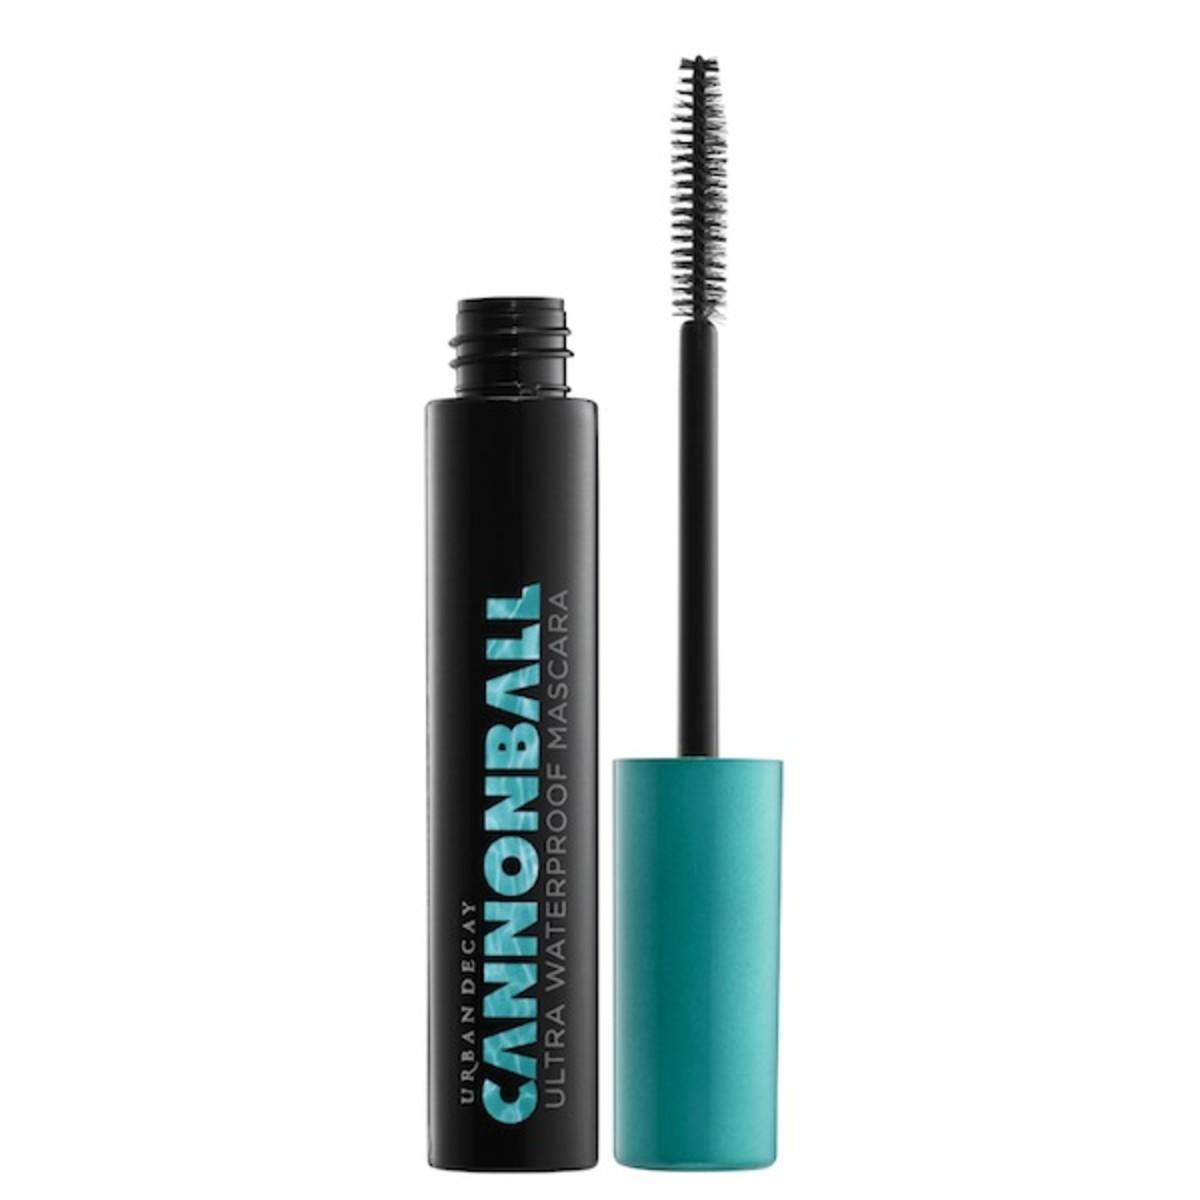 Urban-Decay-Cannonball-Ultra-Waterproof-Mascara